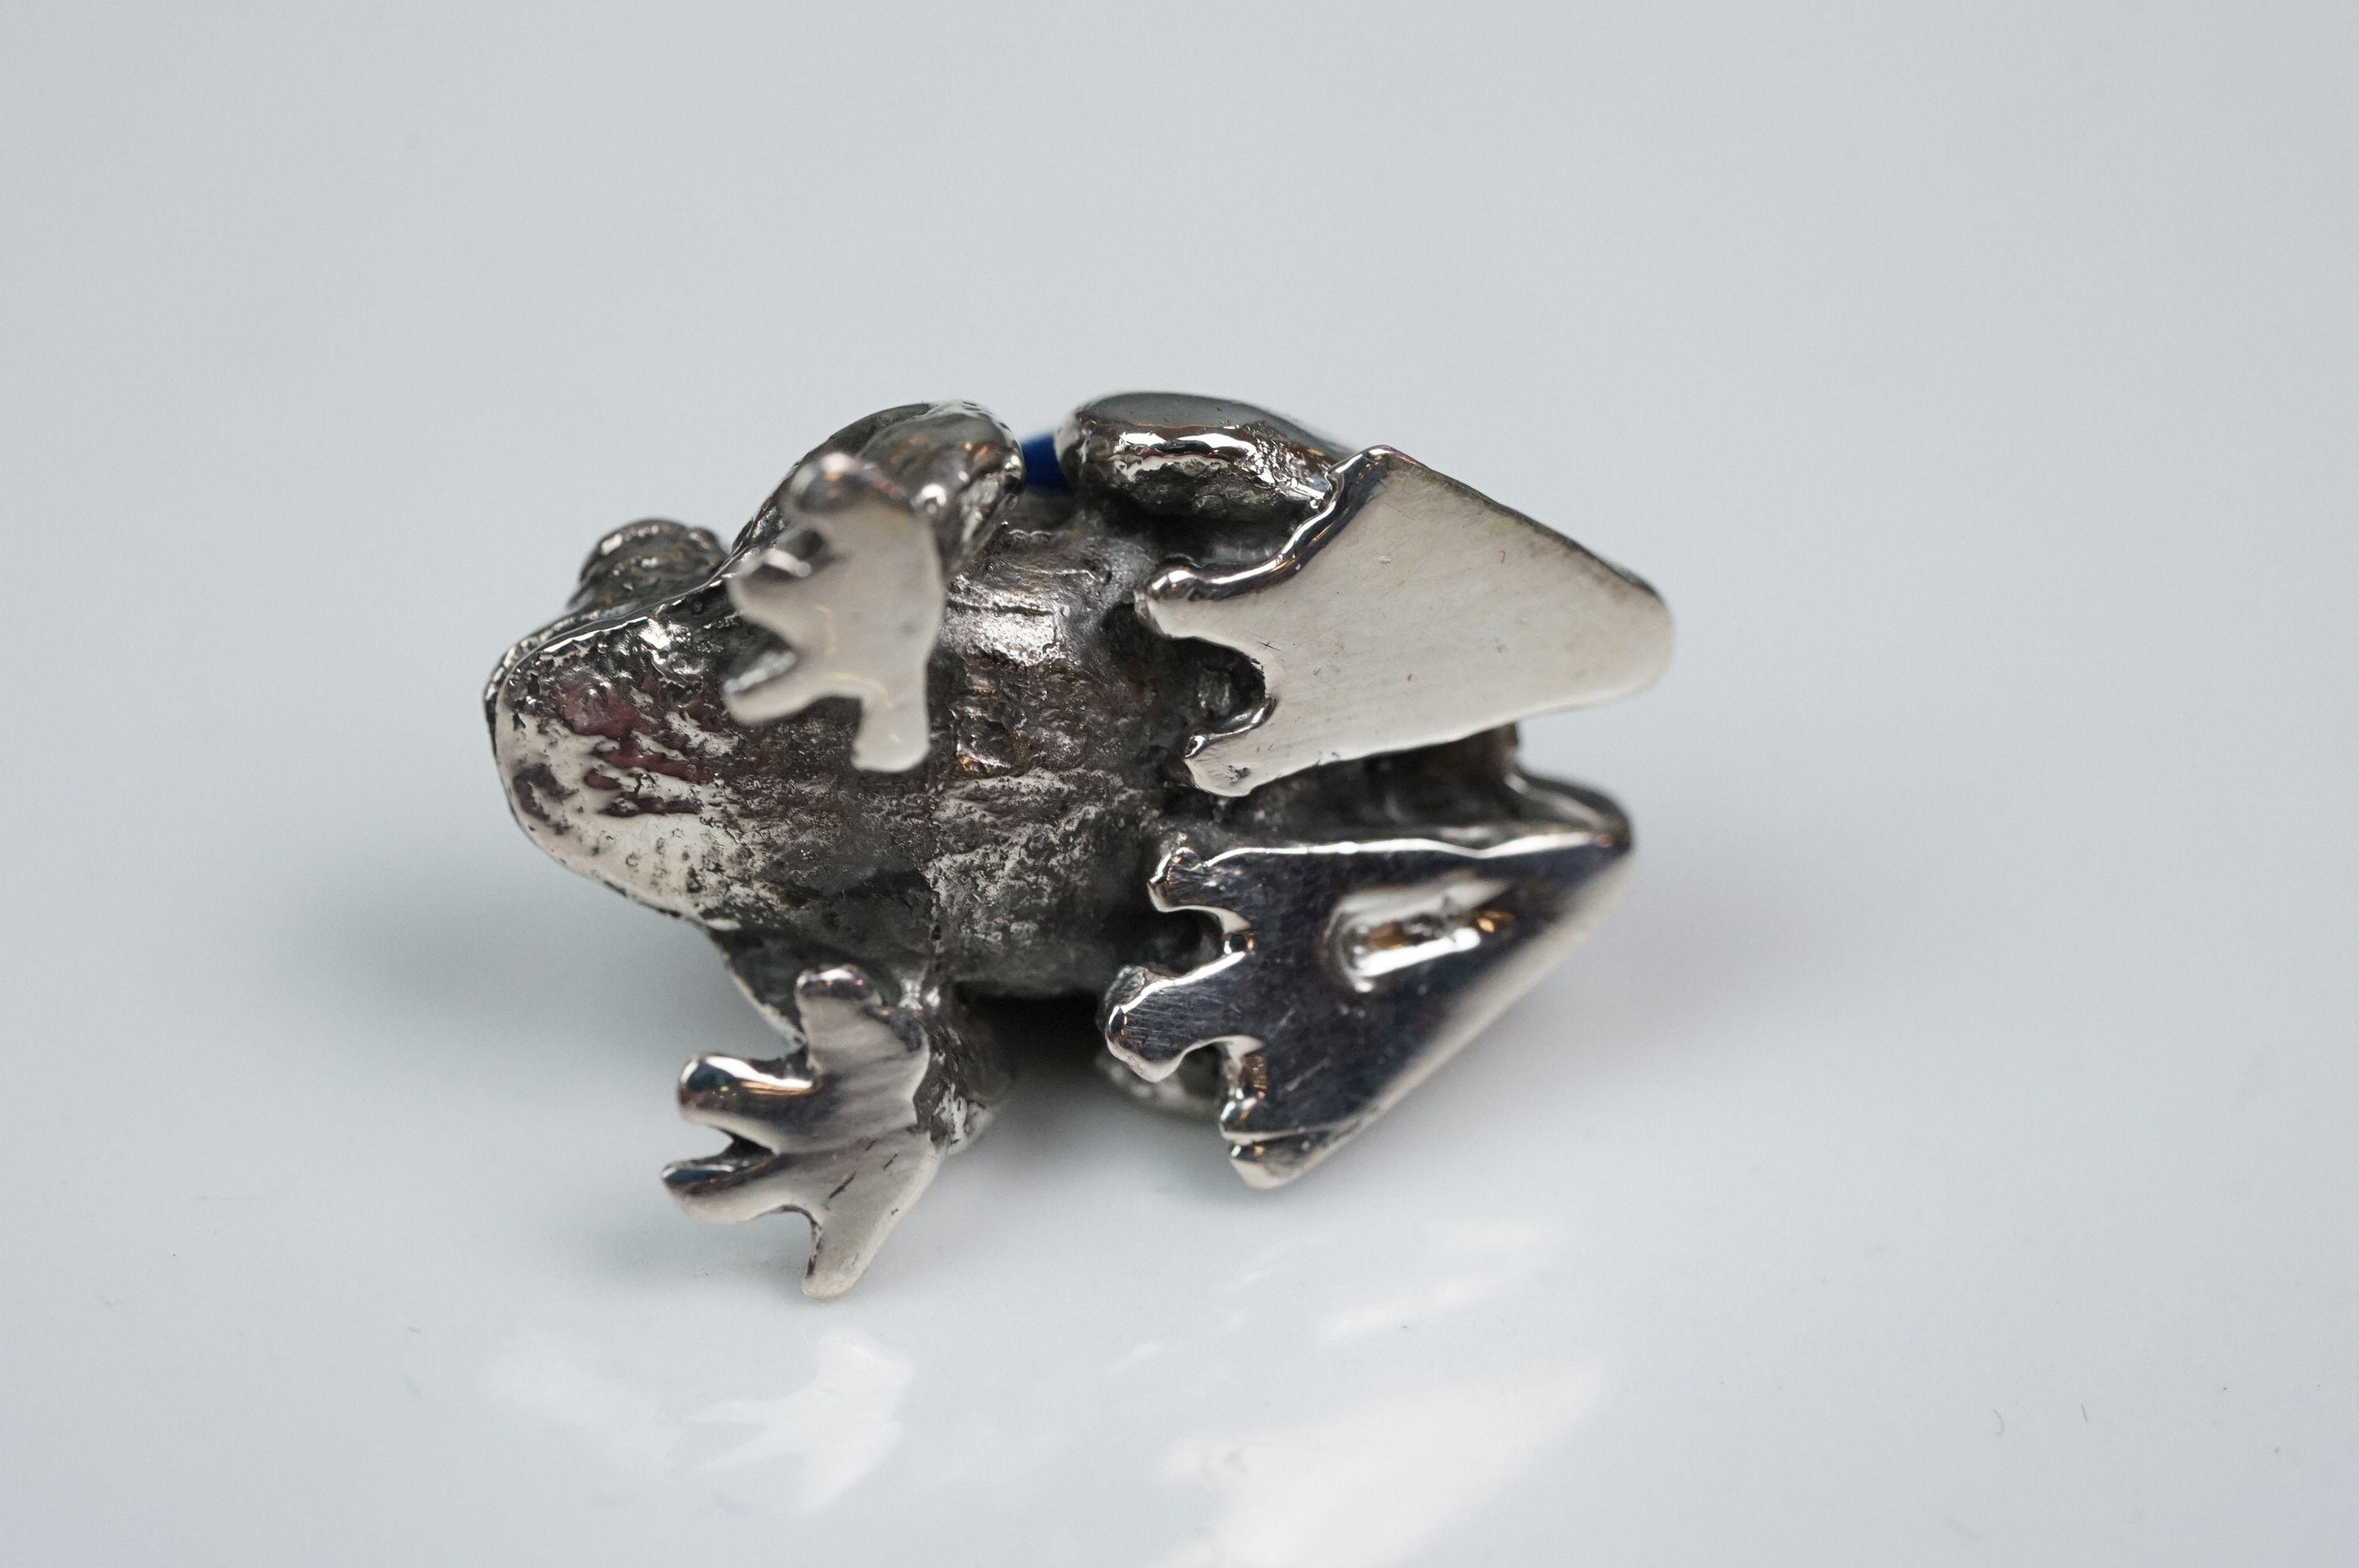 Silver frog pincushion - Image 3 of 4